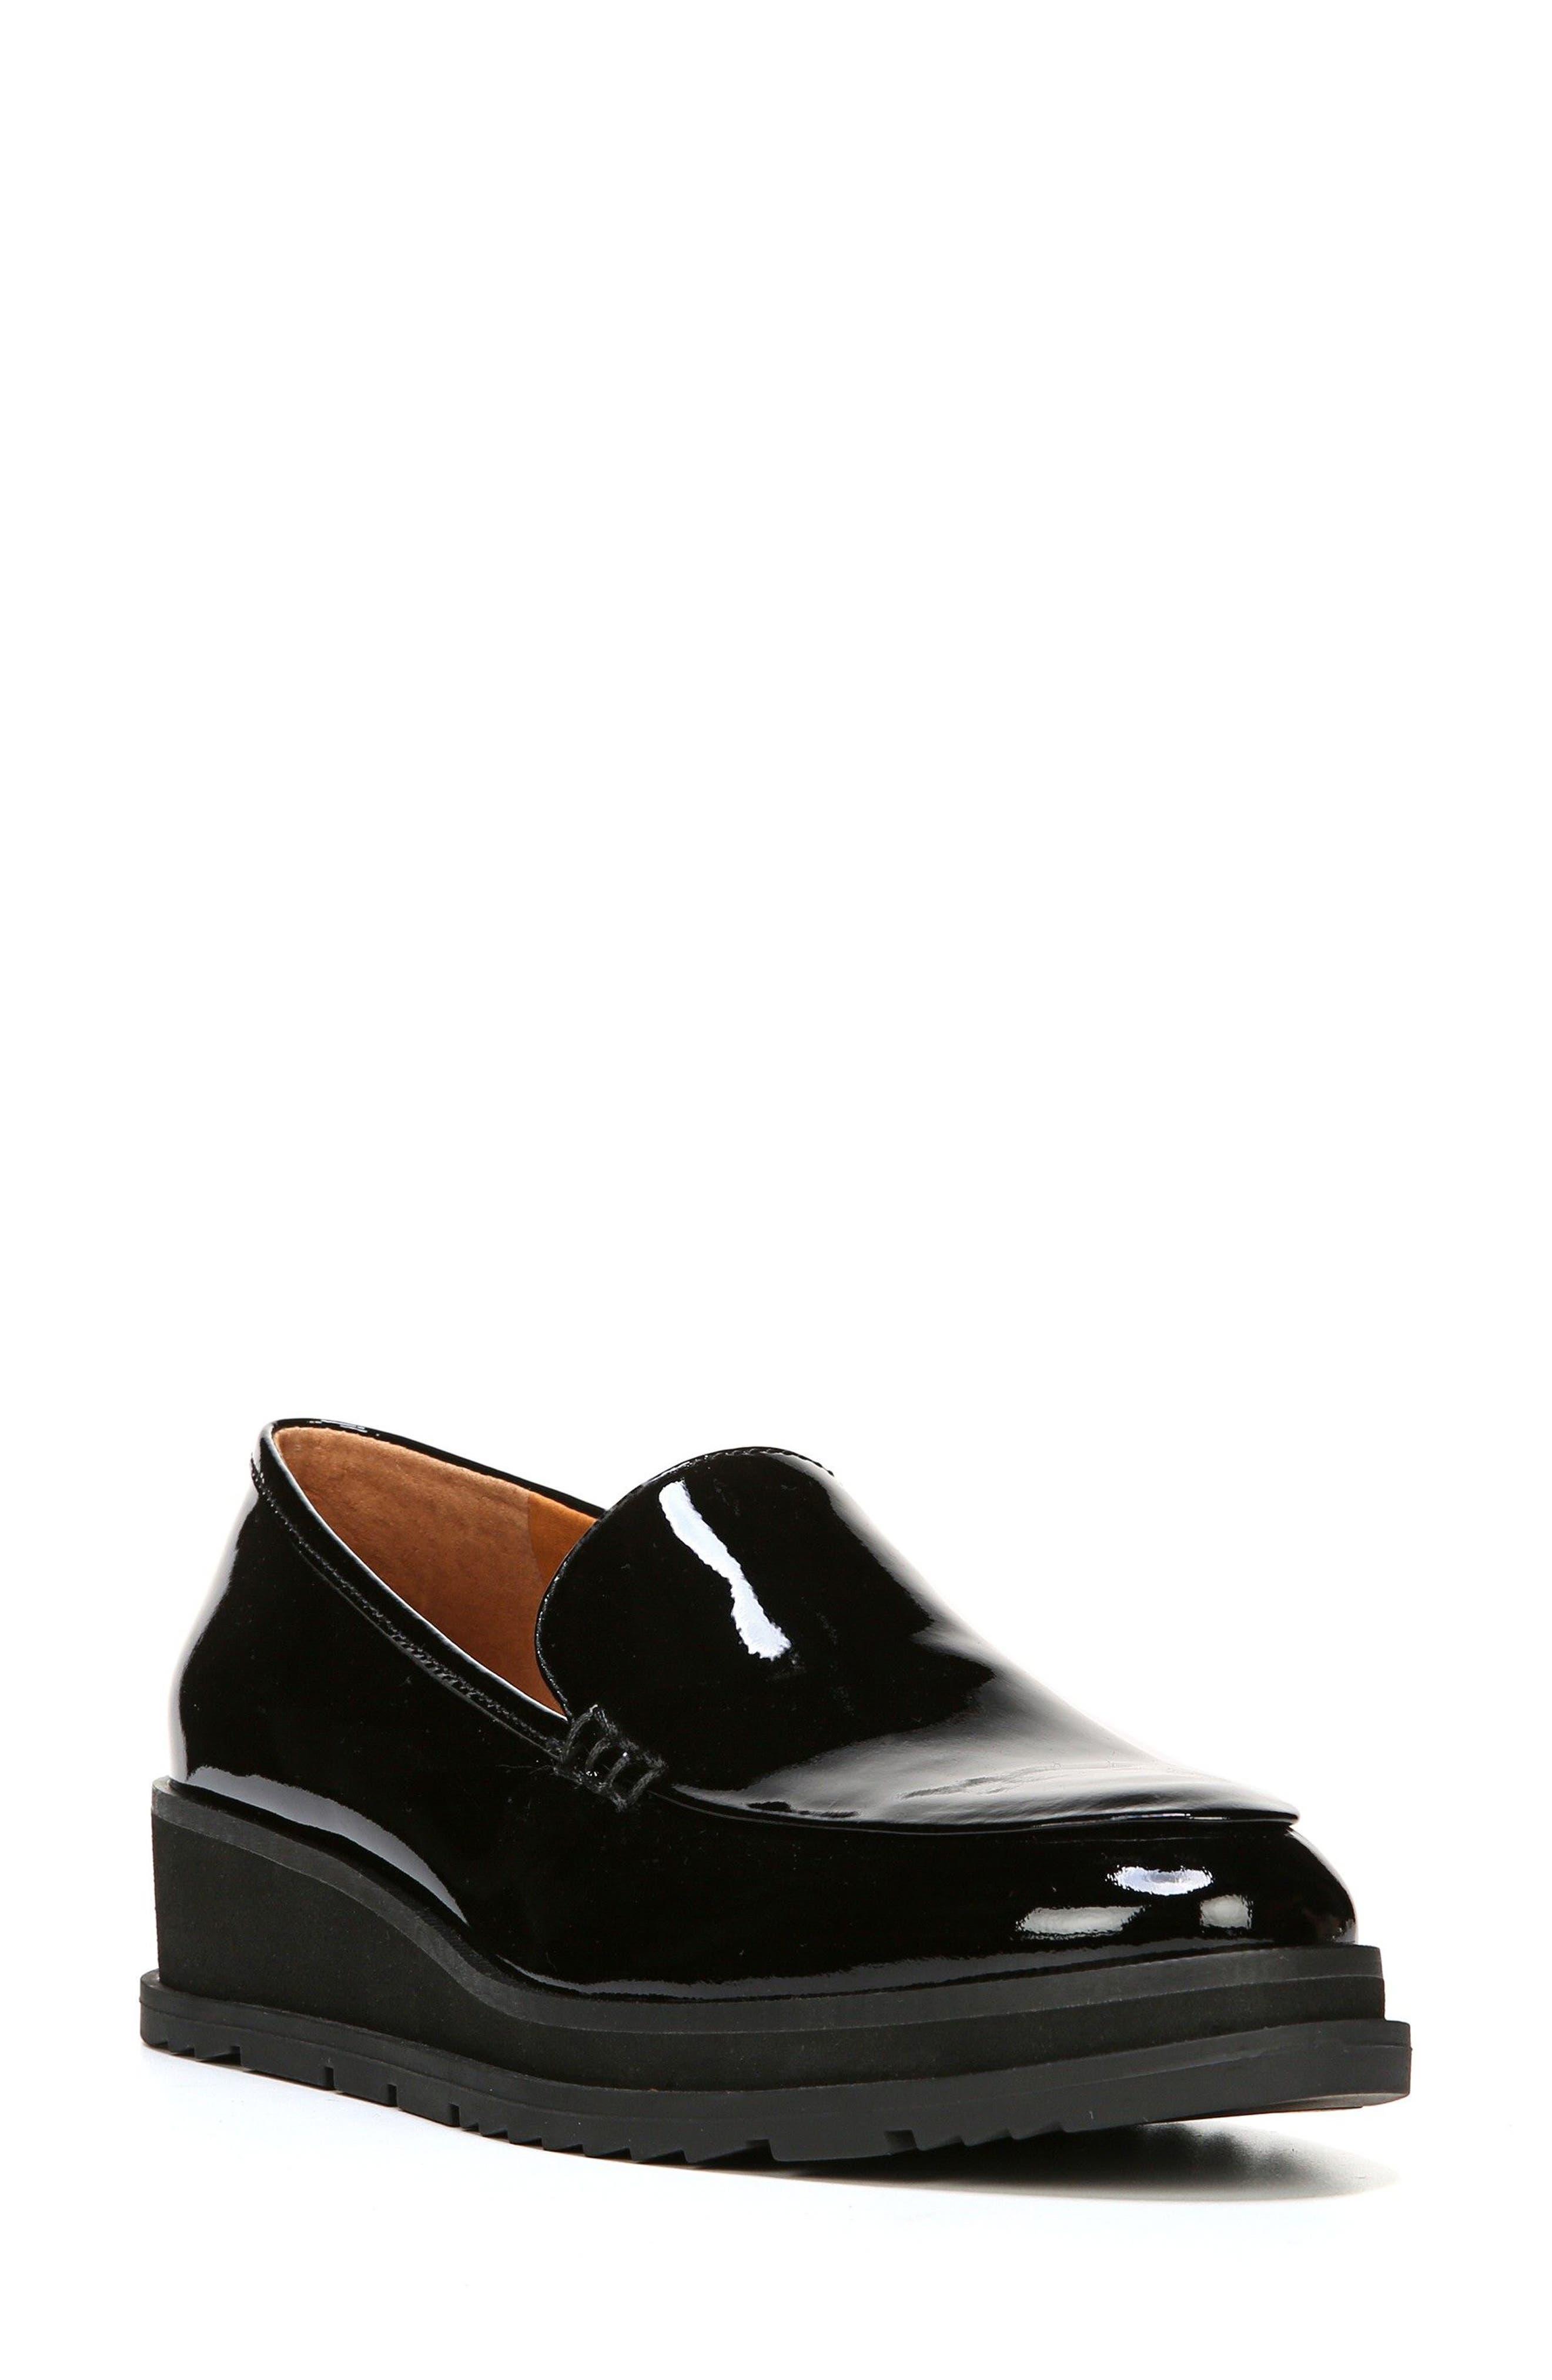 SARTO by Franco Sarto Ayers Loafer Flat (Women)